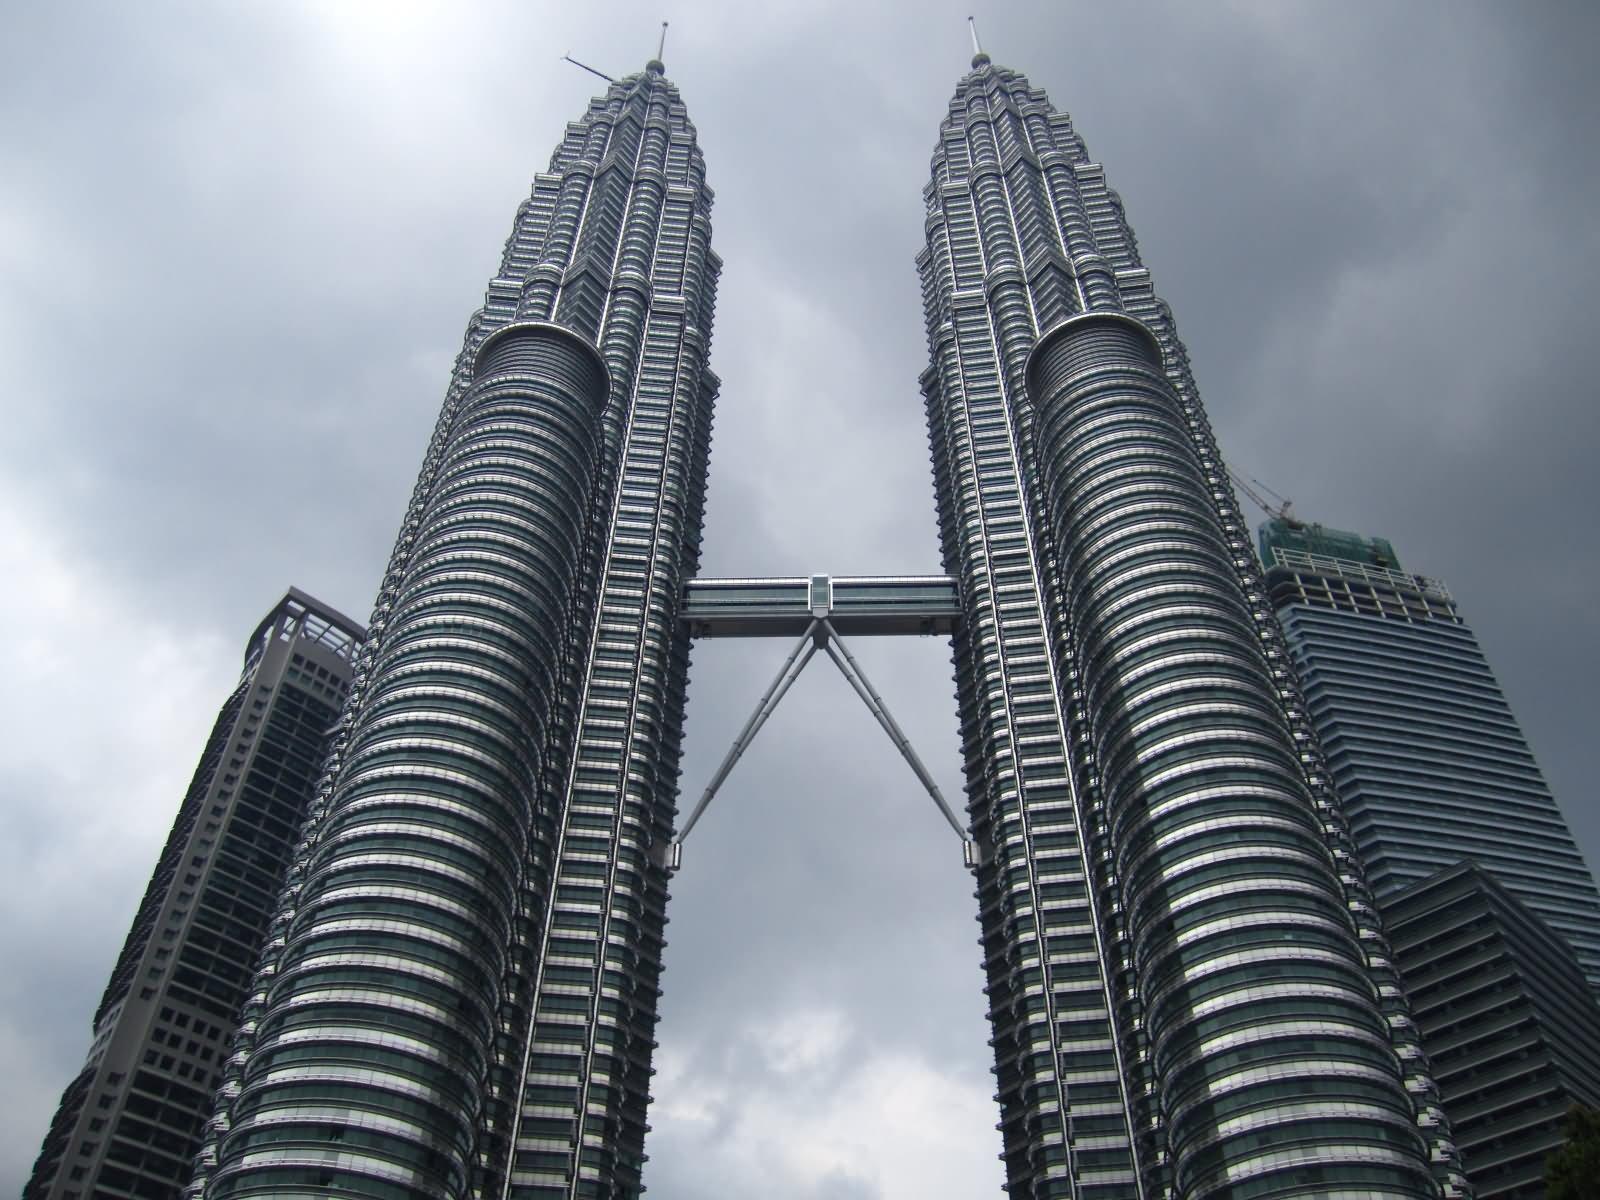 Petronas Twin Towers Closeup View